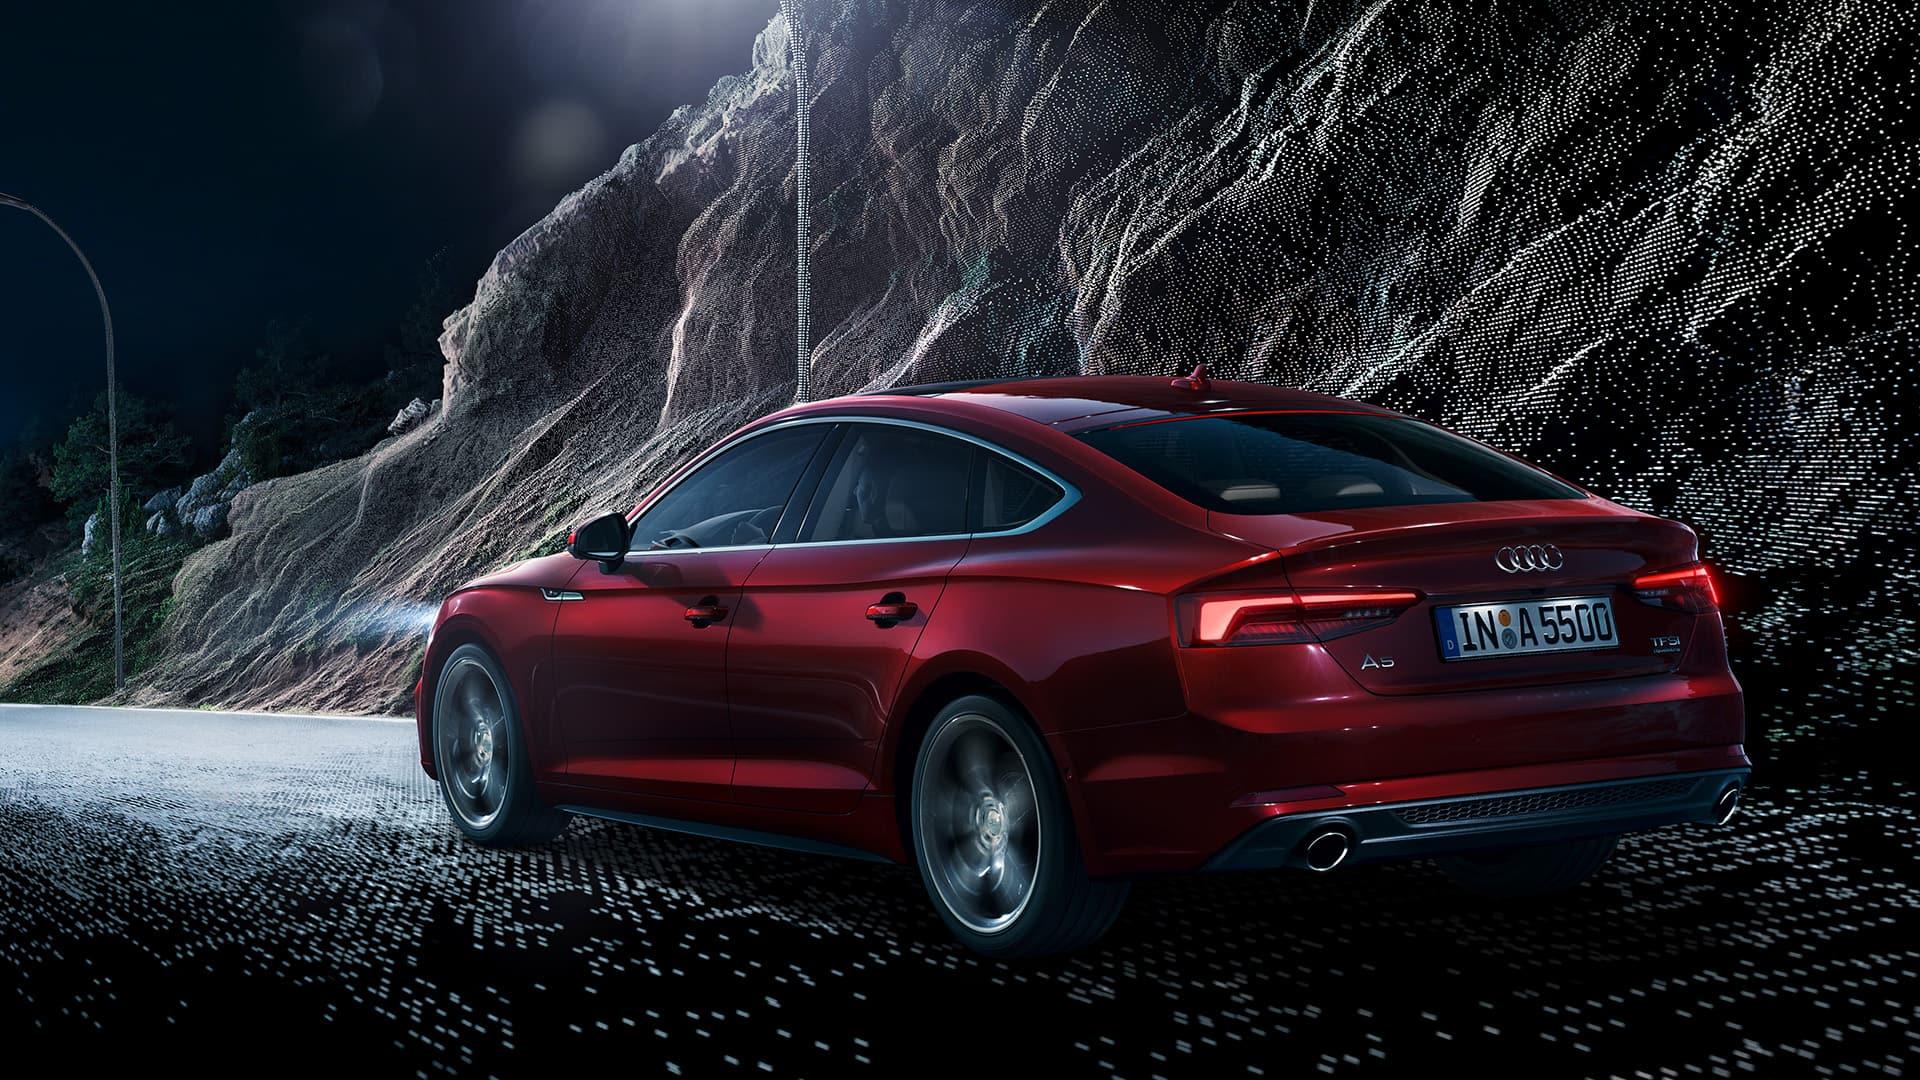 A5 Sportback A5 Audi Deutschland